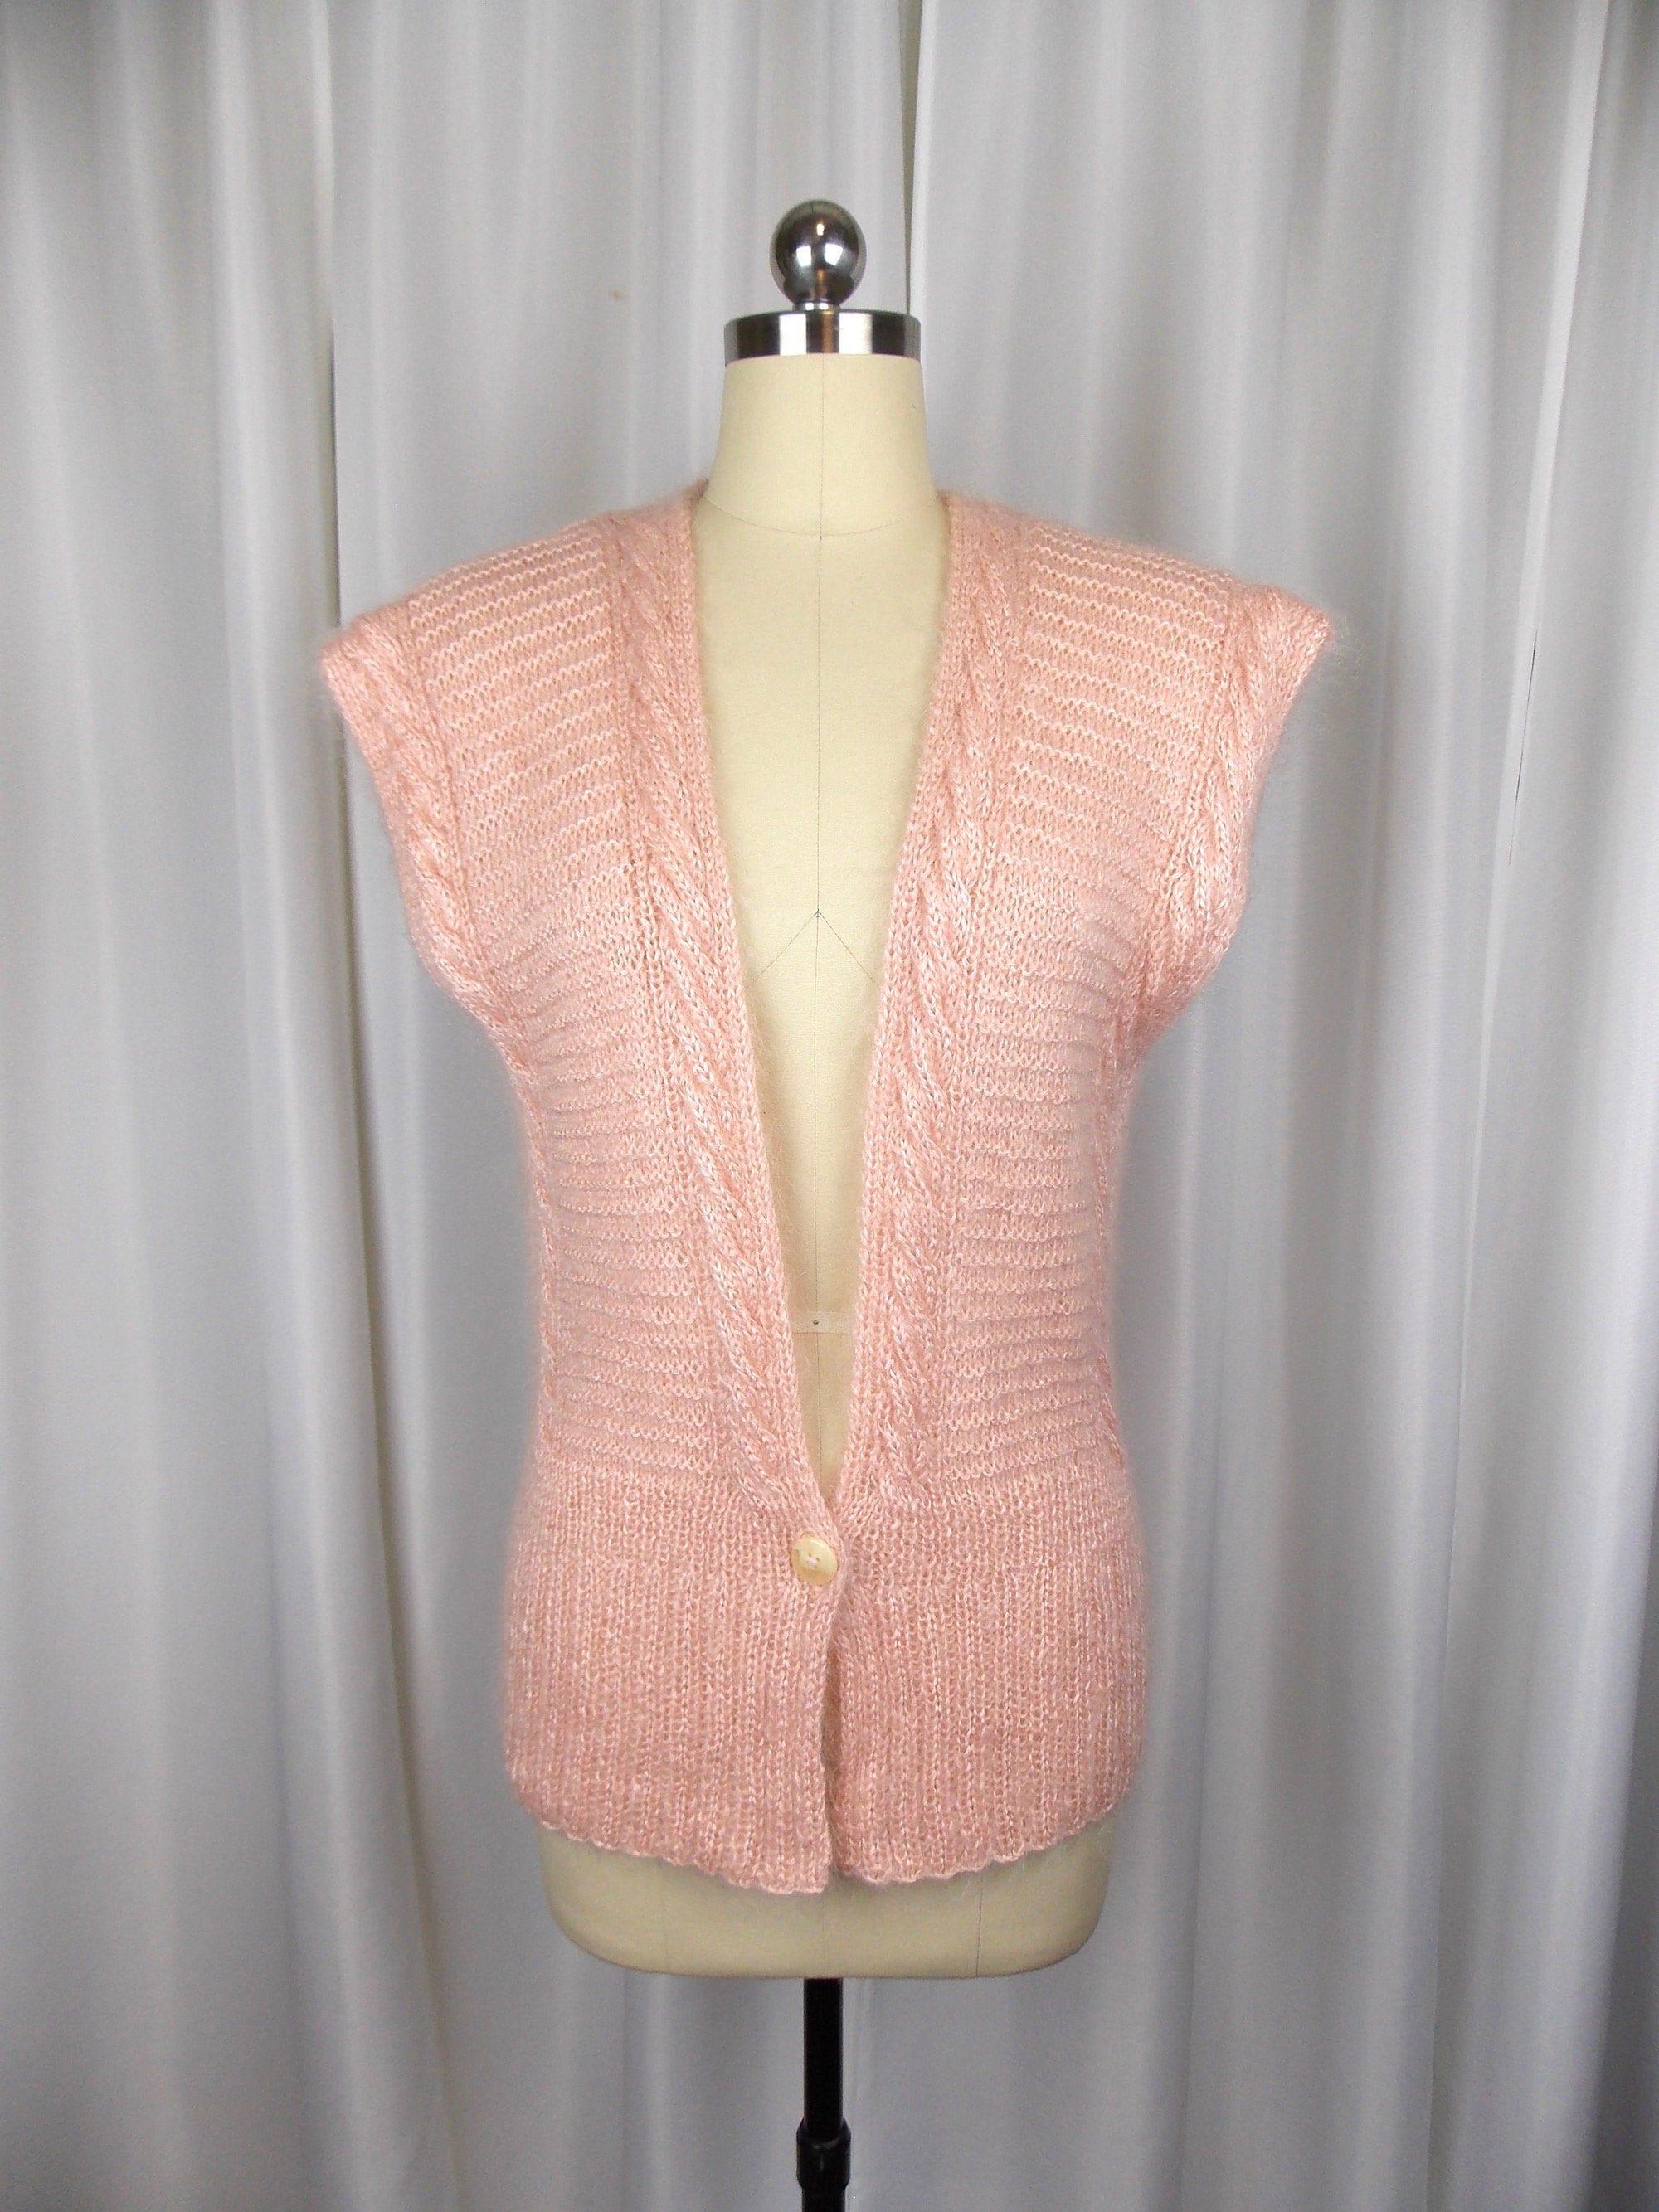 80s Sweatshirts, Sweaters, Vests | Women Pink Sweater Vest Linda Allard For Ellen Tracy Size S 1980s 1990s $38.00 AT vintagedancer.com